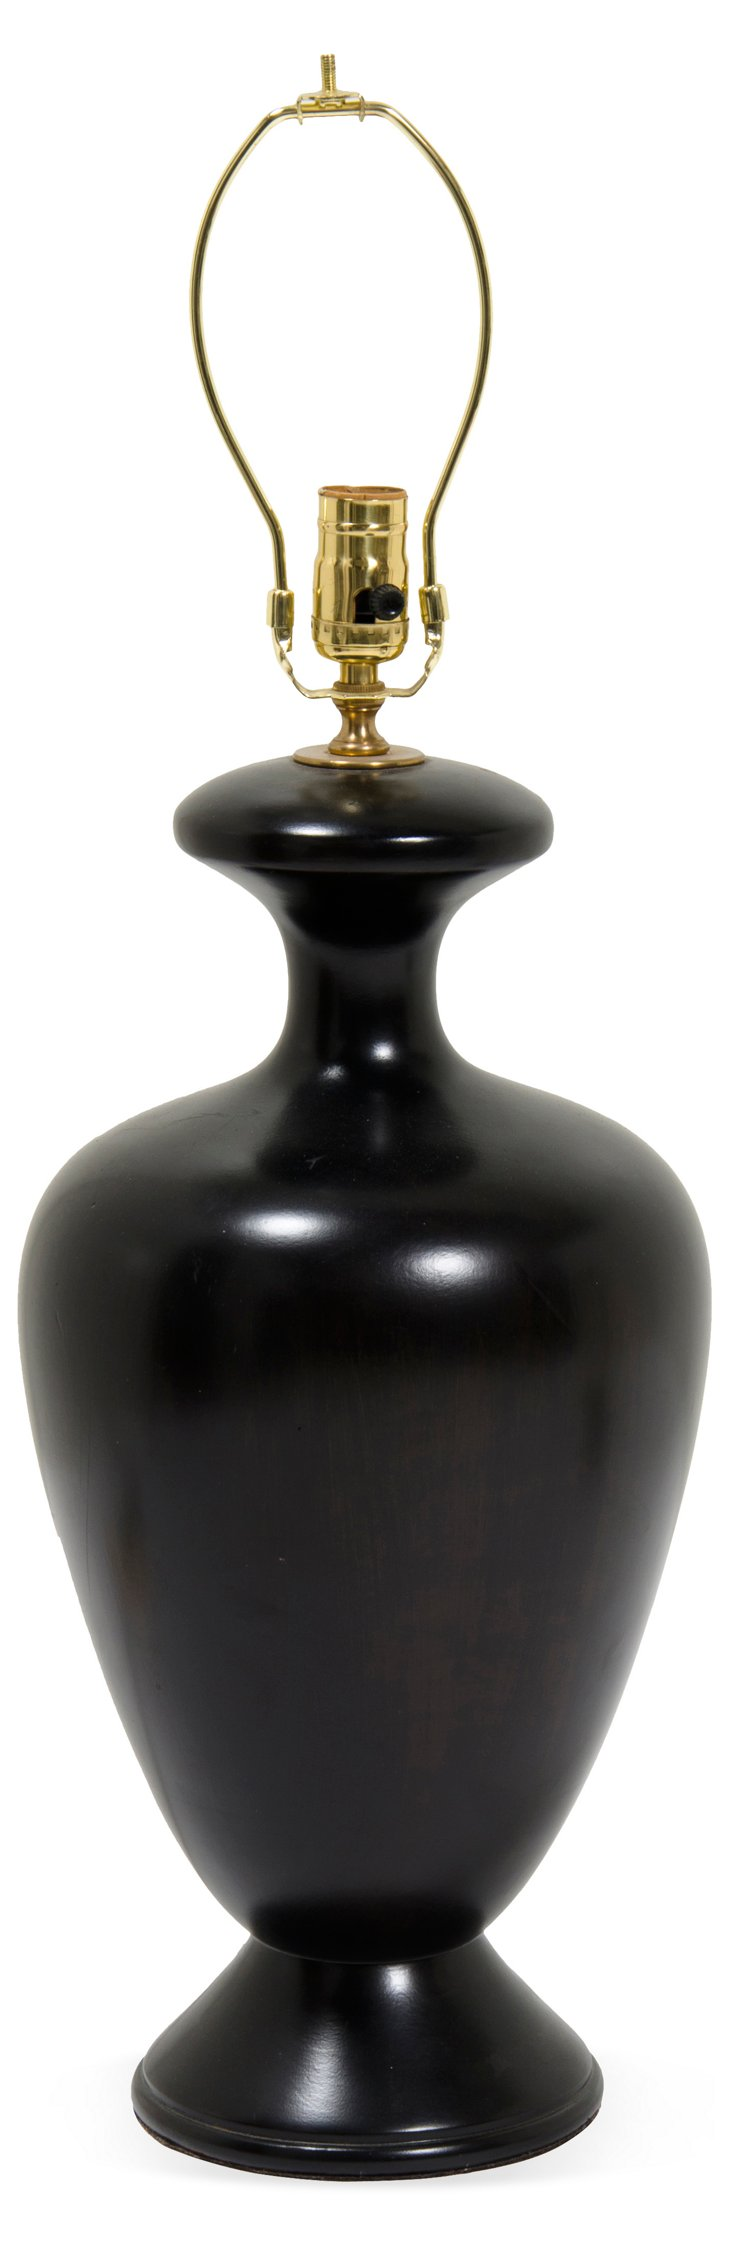 Vintage Wood Urn Table Lamp